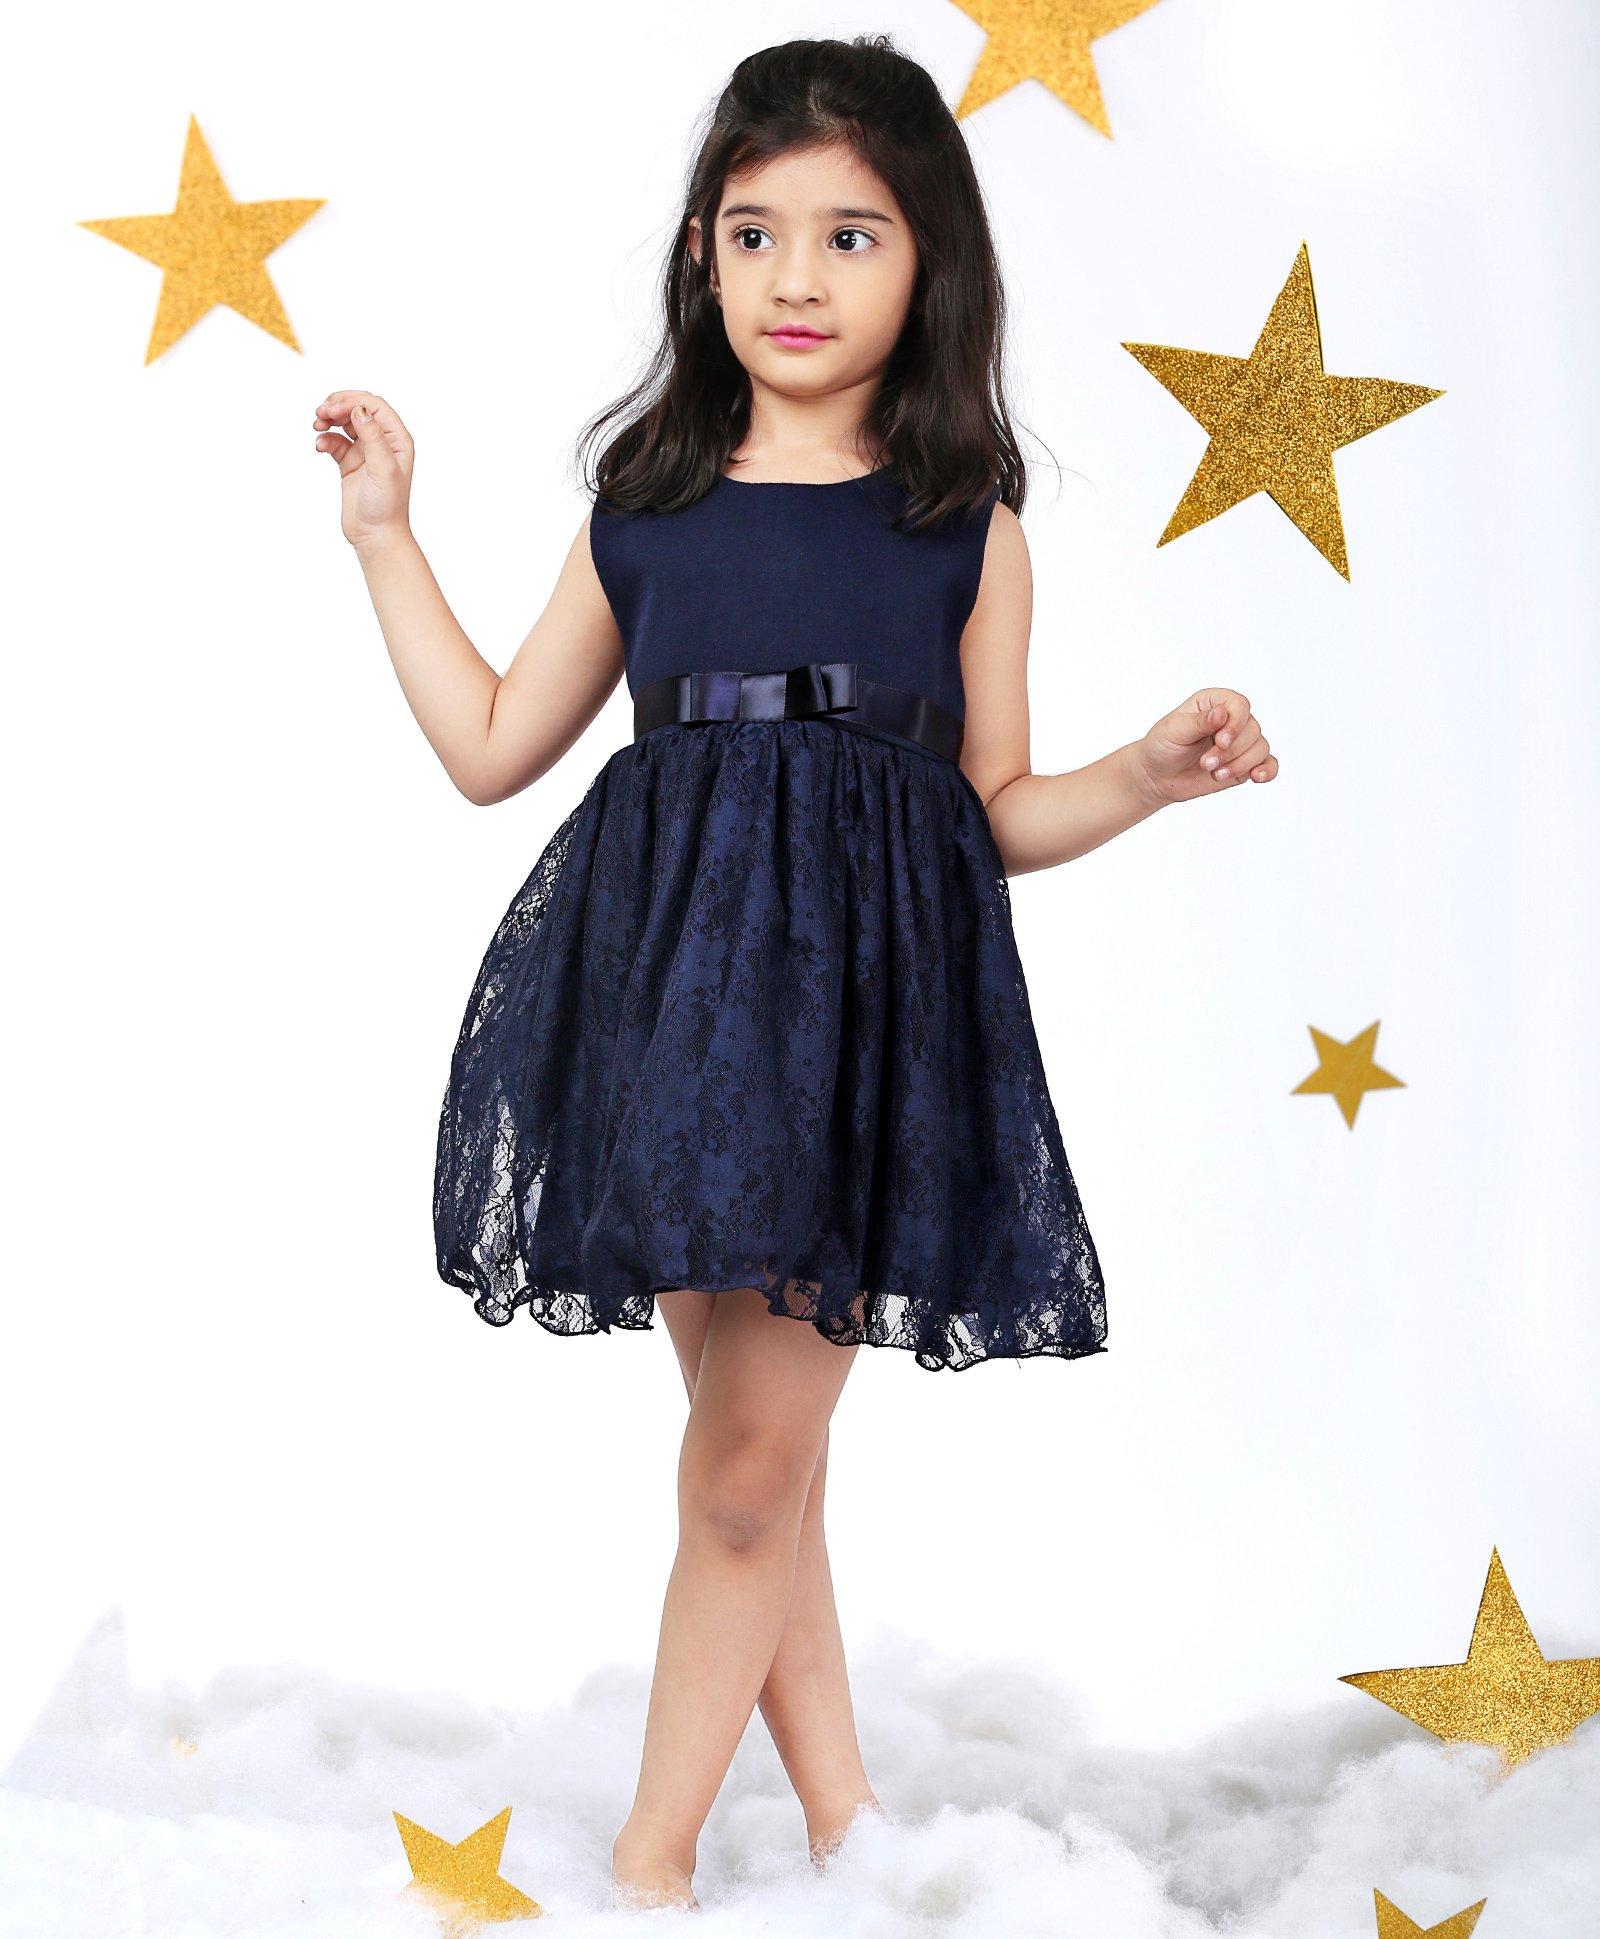 ae9a2c77c1e4c Buy Mark & Mia Flower Embroidery On Net Sleeveless Dress Dark ...